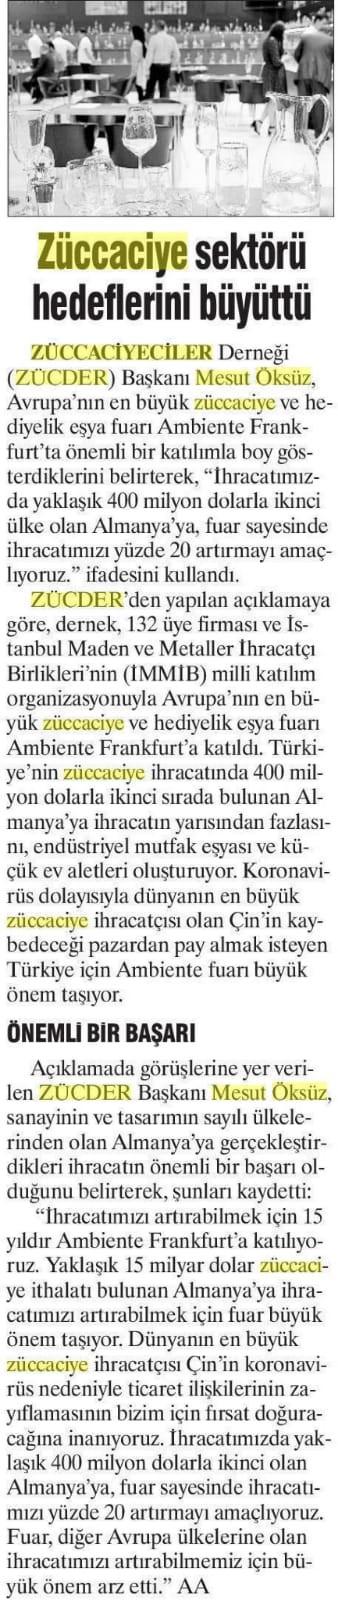 Zücder Günboyu 14.02.2020